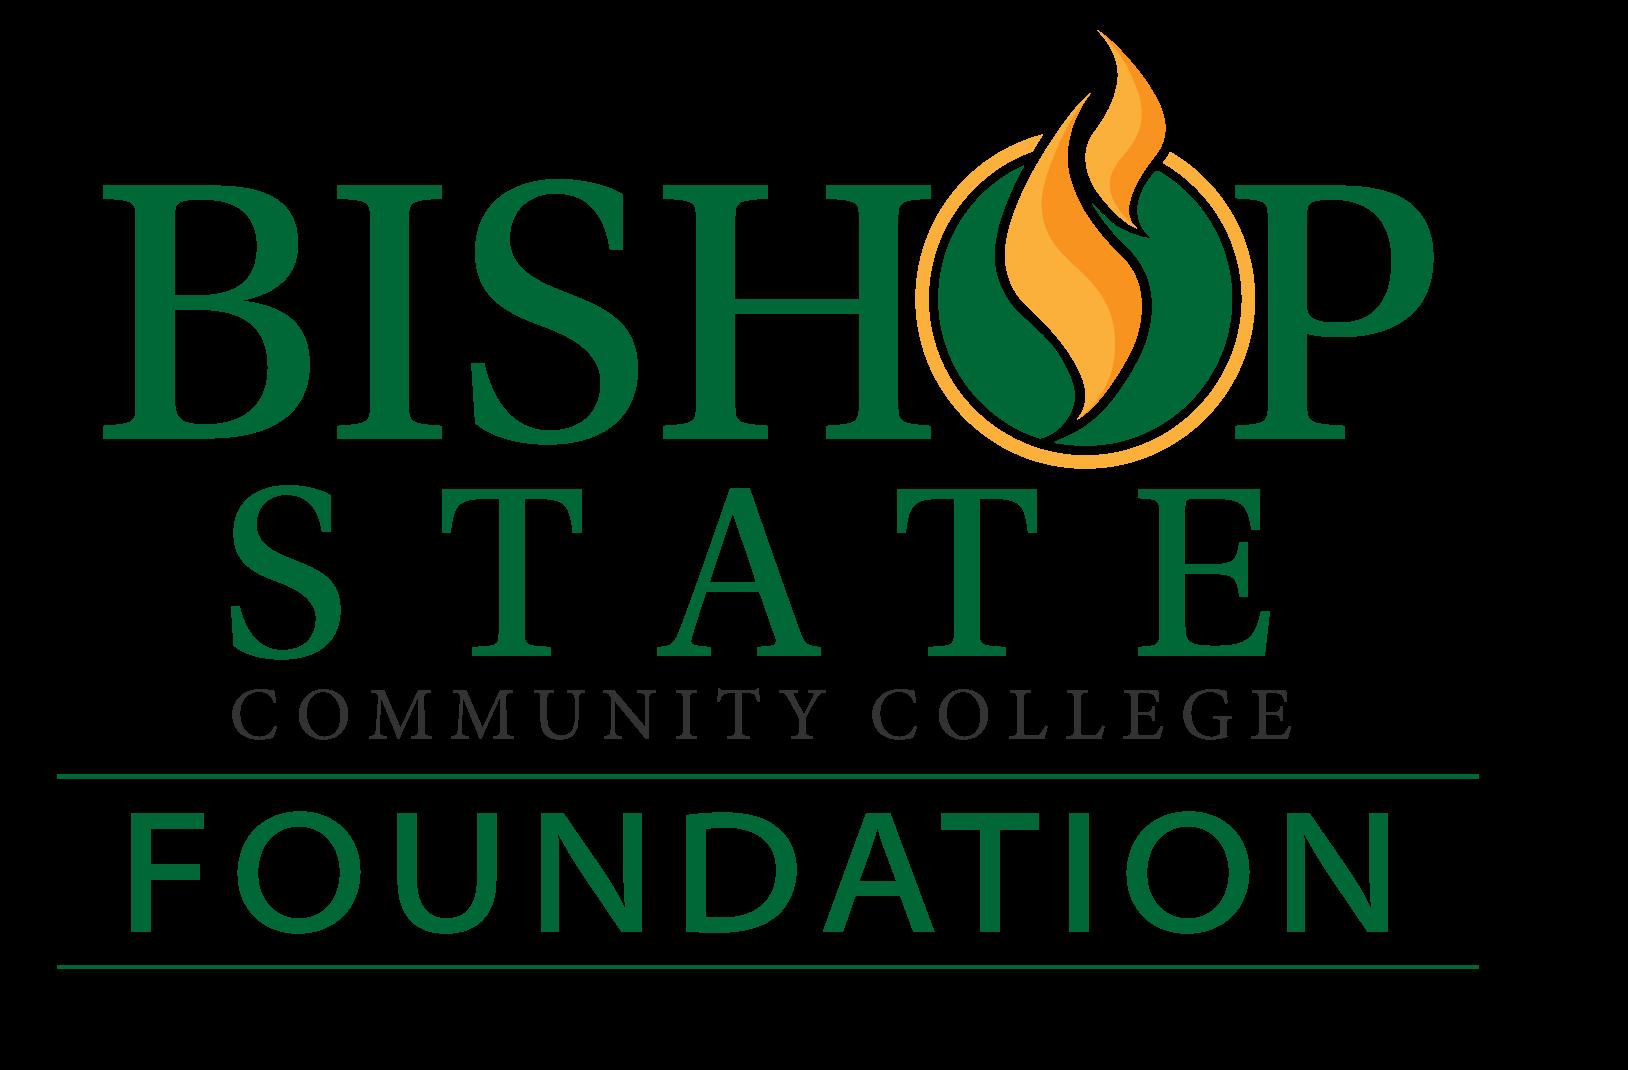 Bishop State Foundation Logo